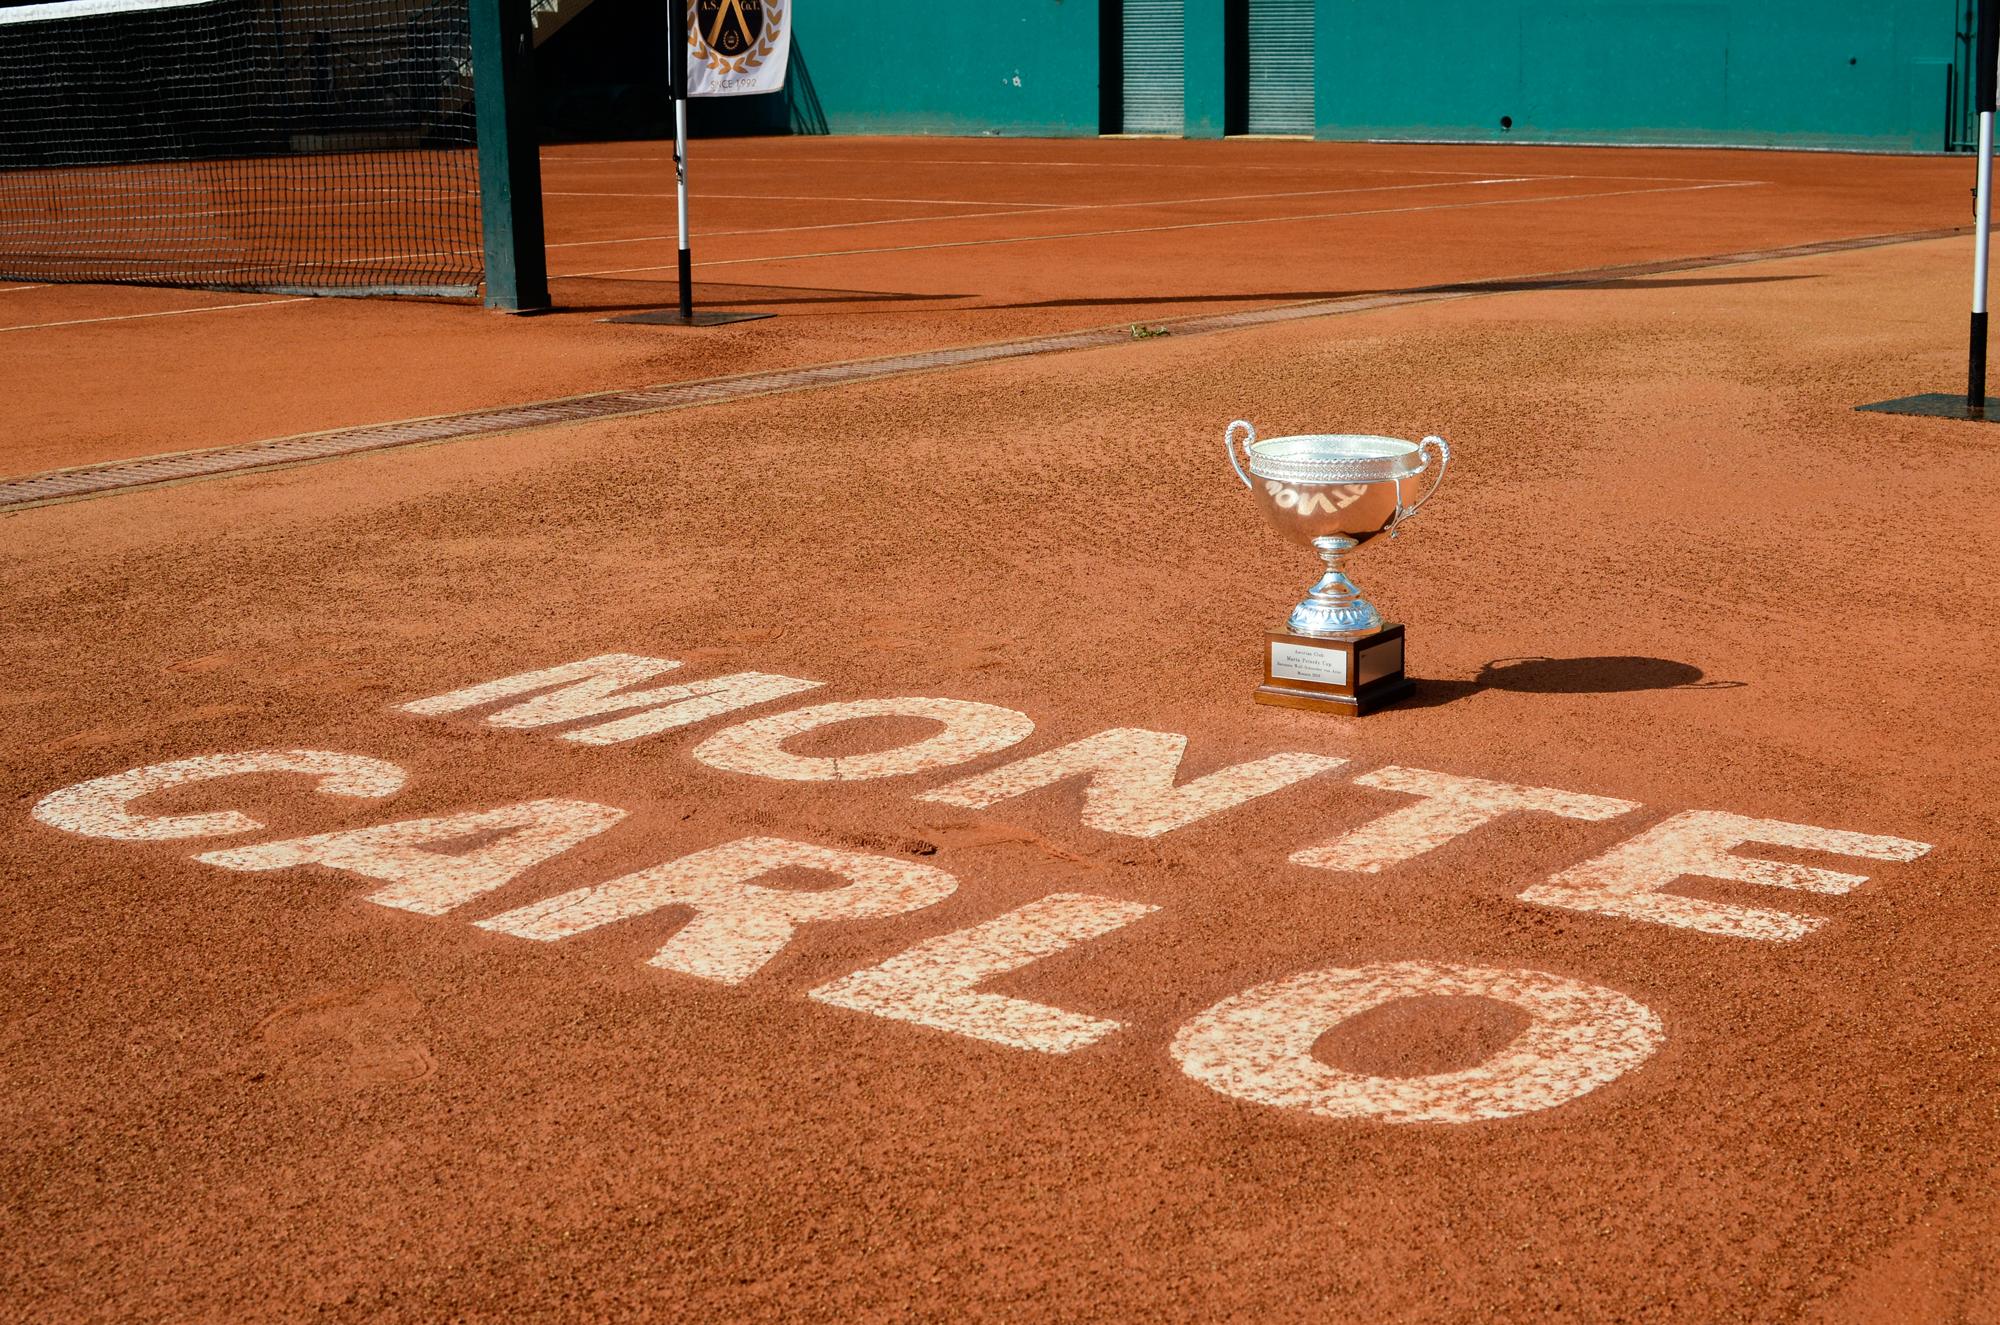 Women's Monaco Tournament 2019